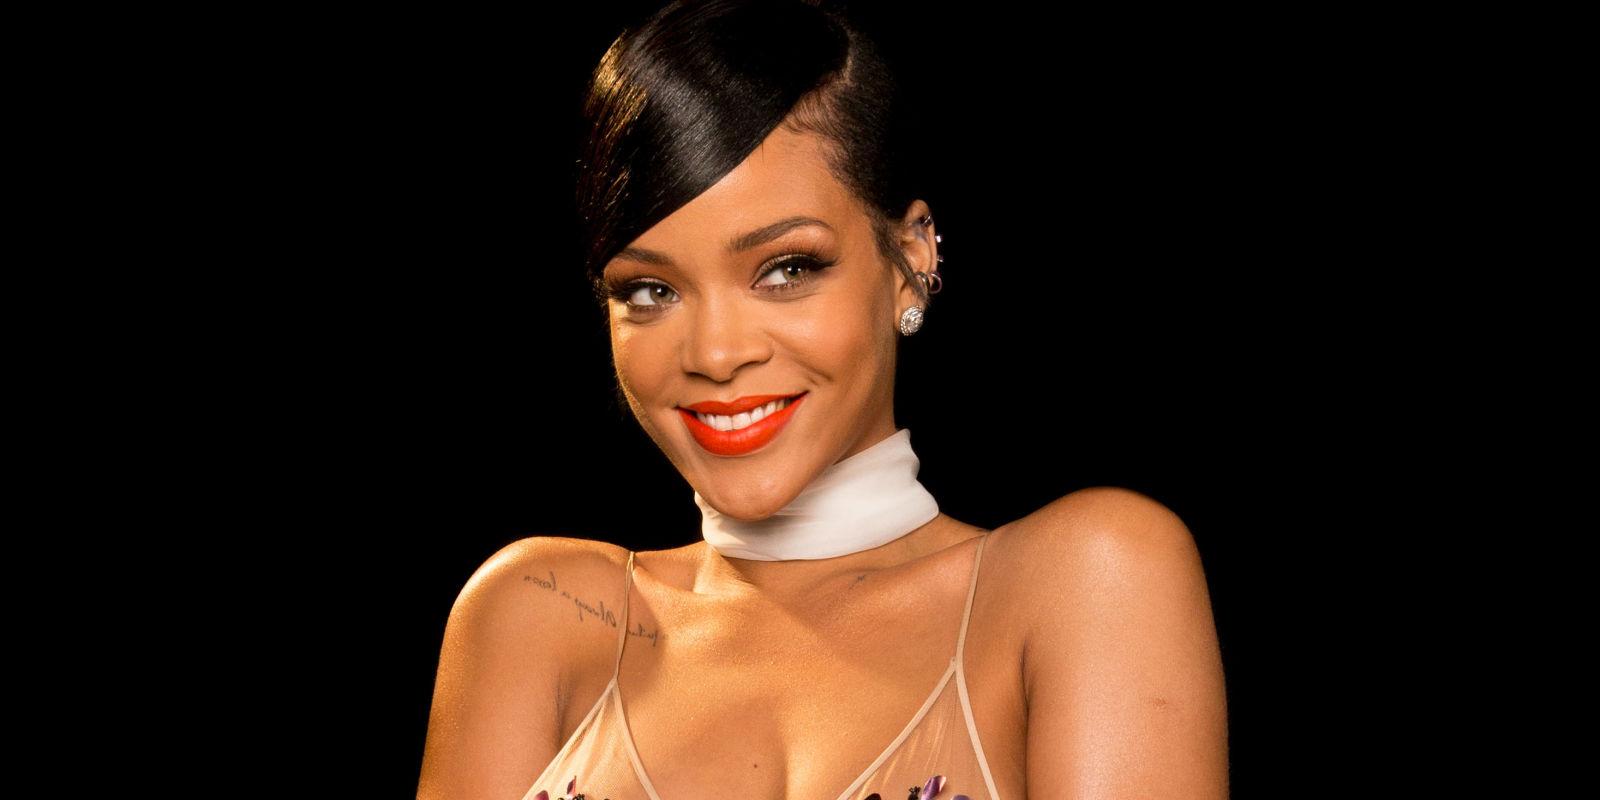 Rihanna: Rihanna Launching Makeup Line